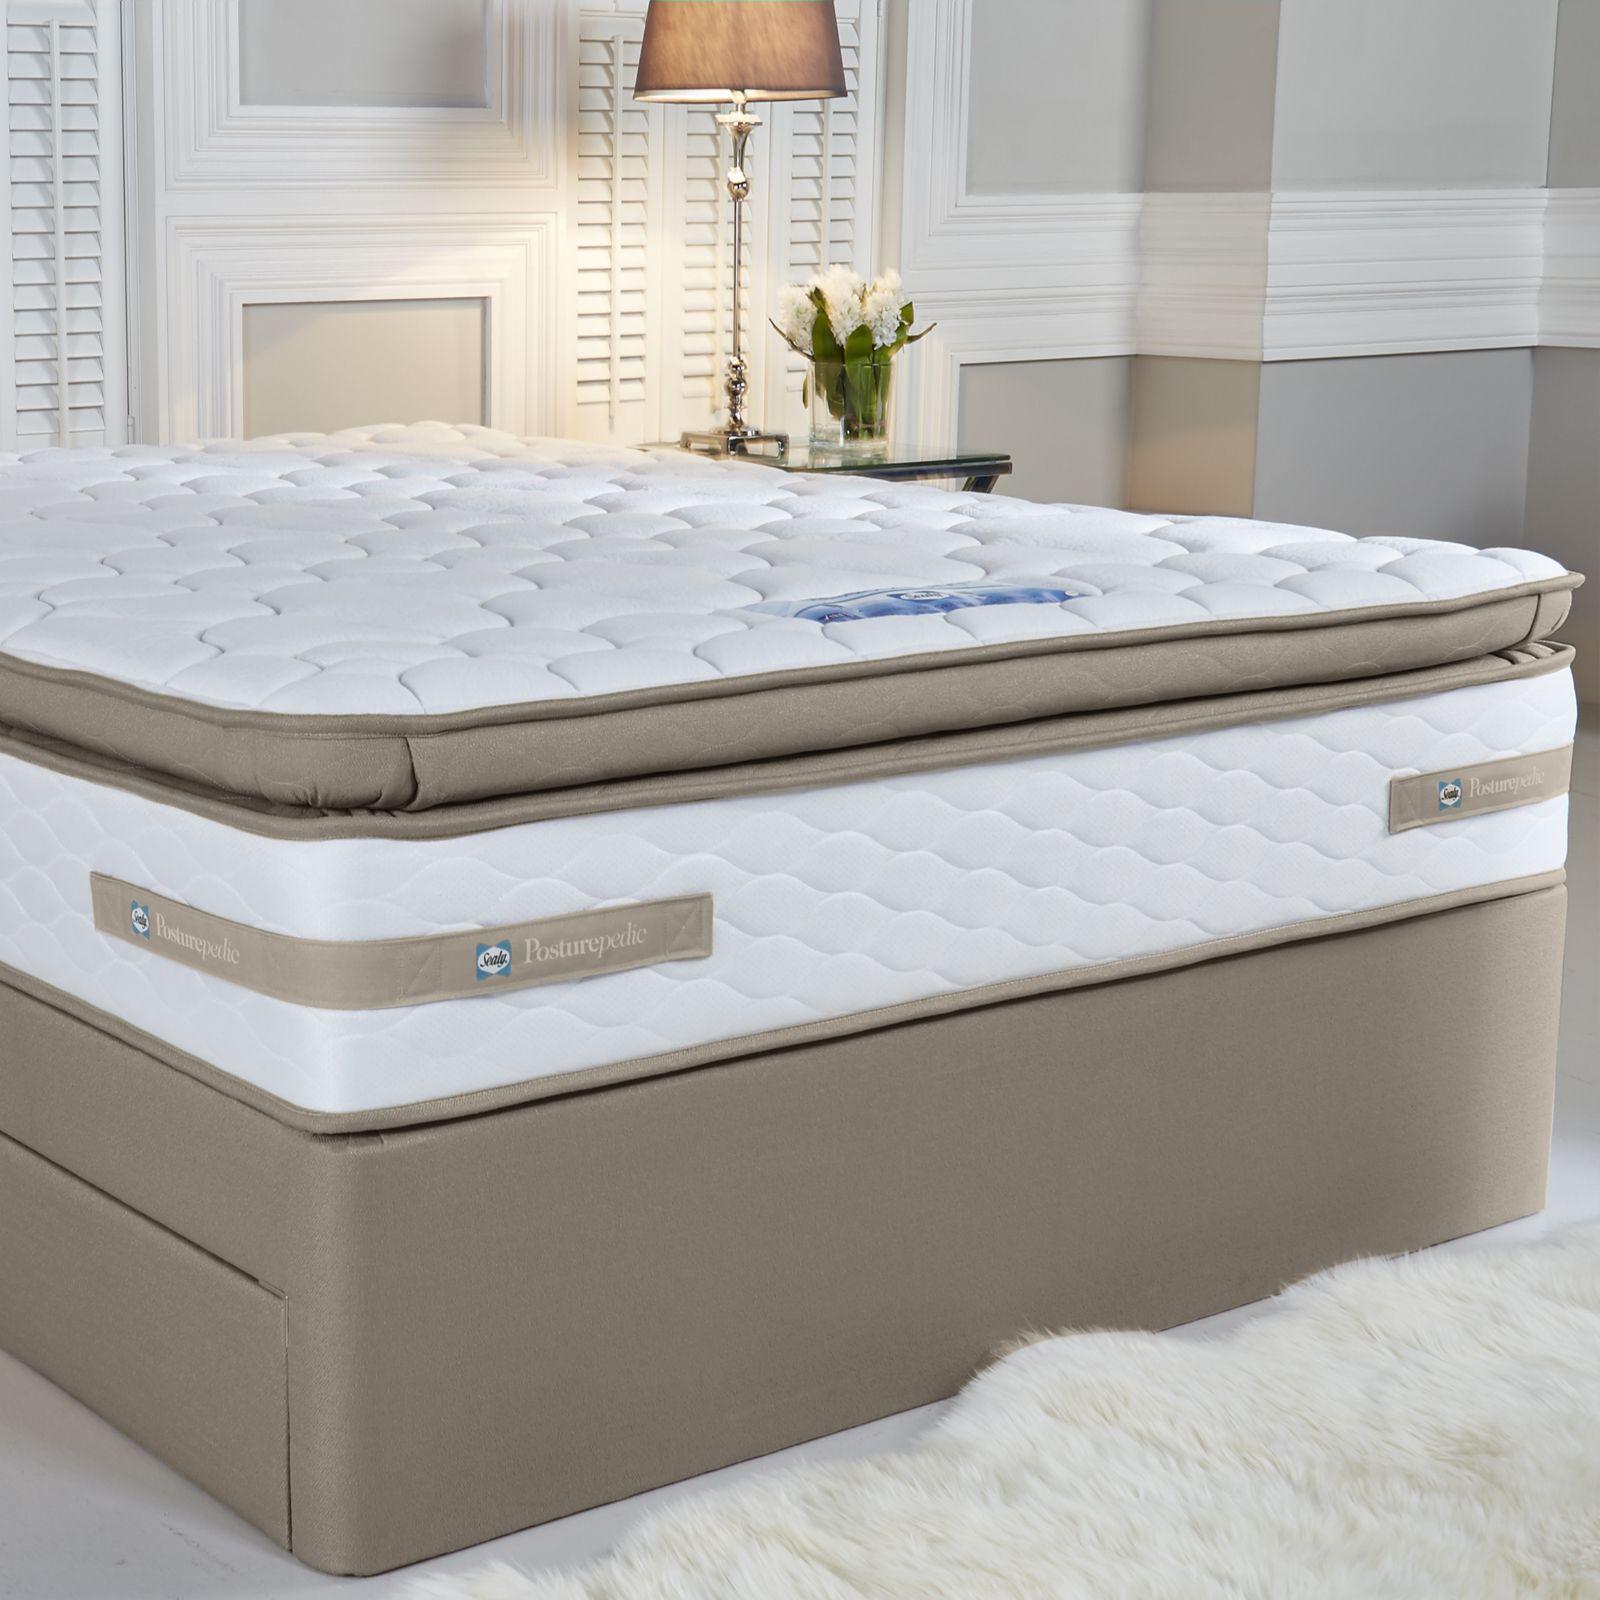 sealy 660 spring geltex pillow top mattress page 1 qvc uk - Sealy Mattress